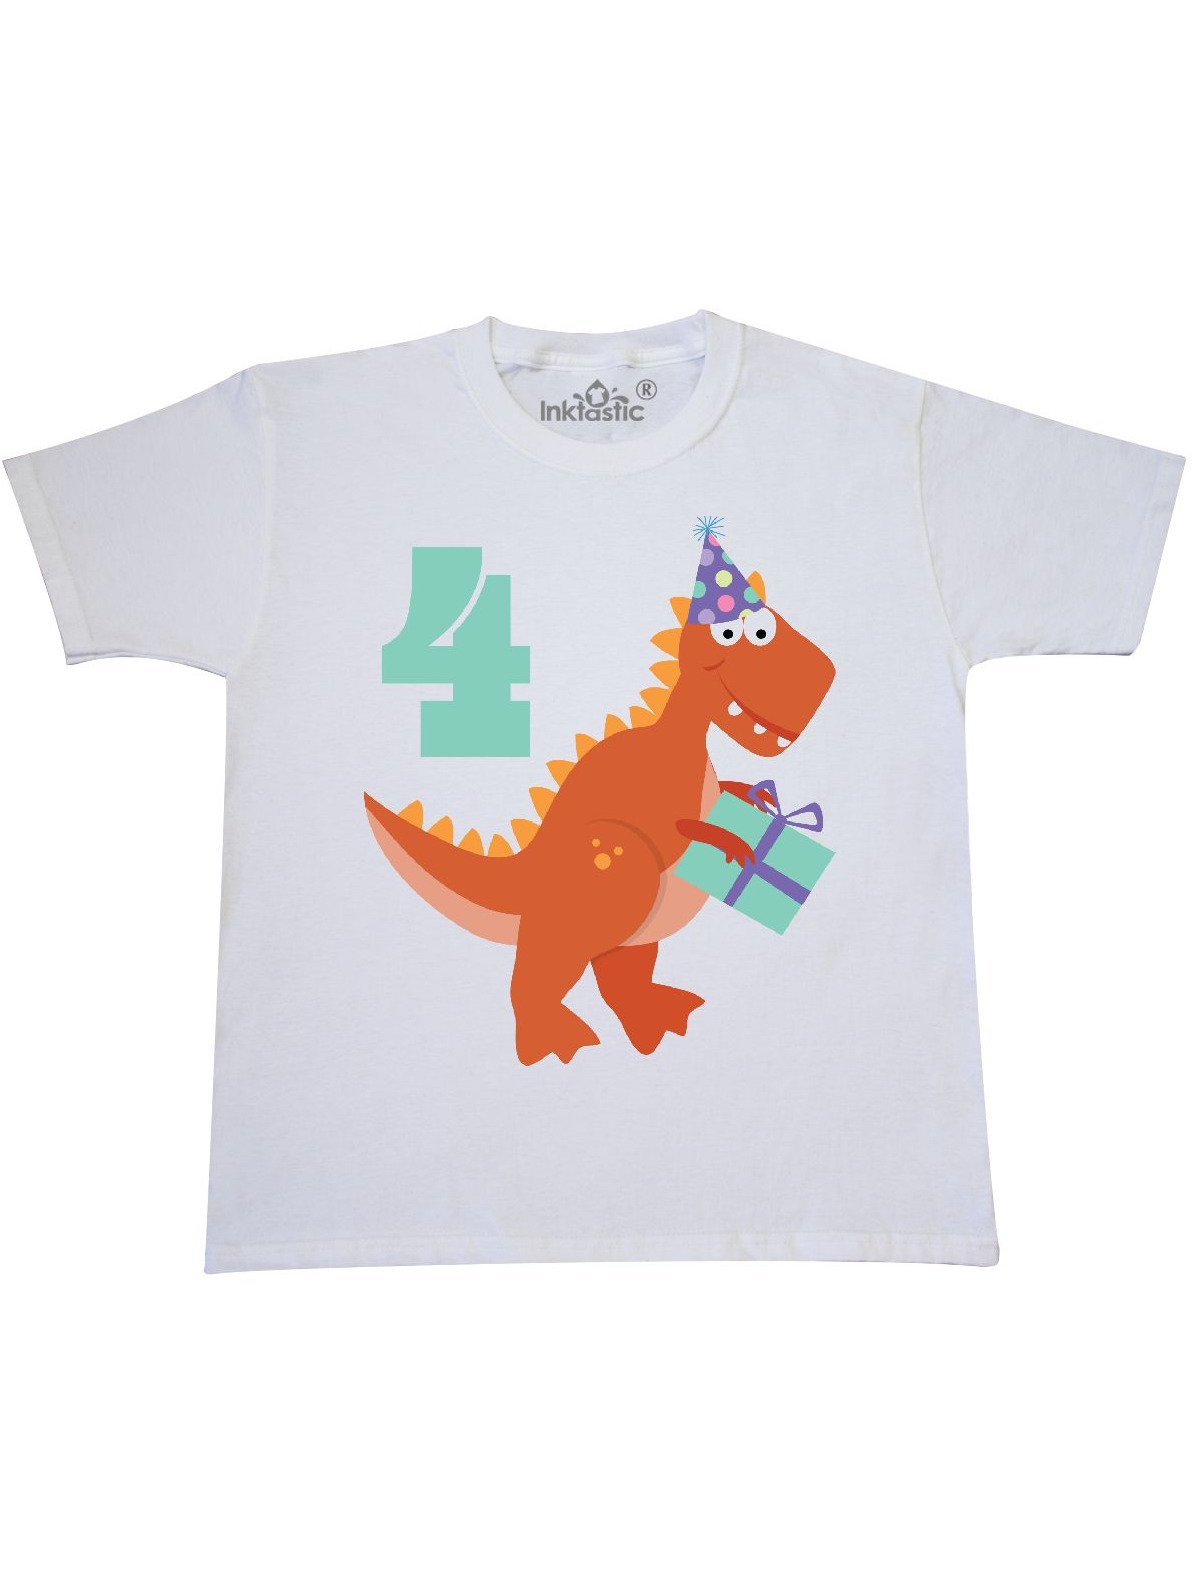 4th Birthday Dinosaur Youth T-Shirt